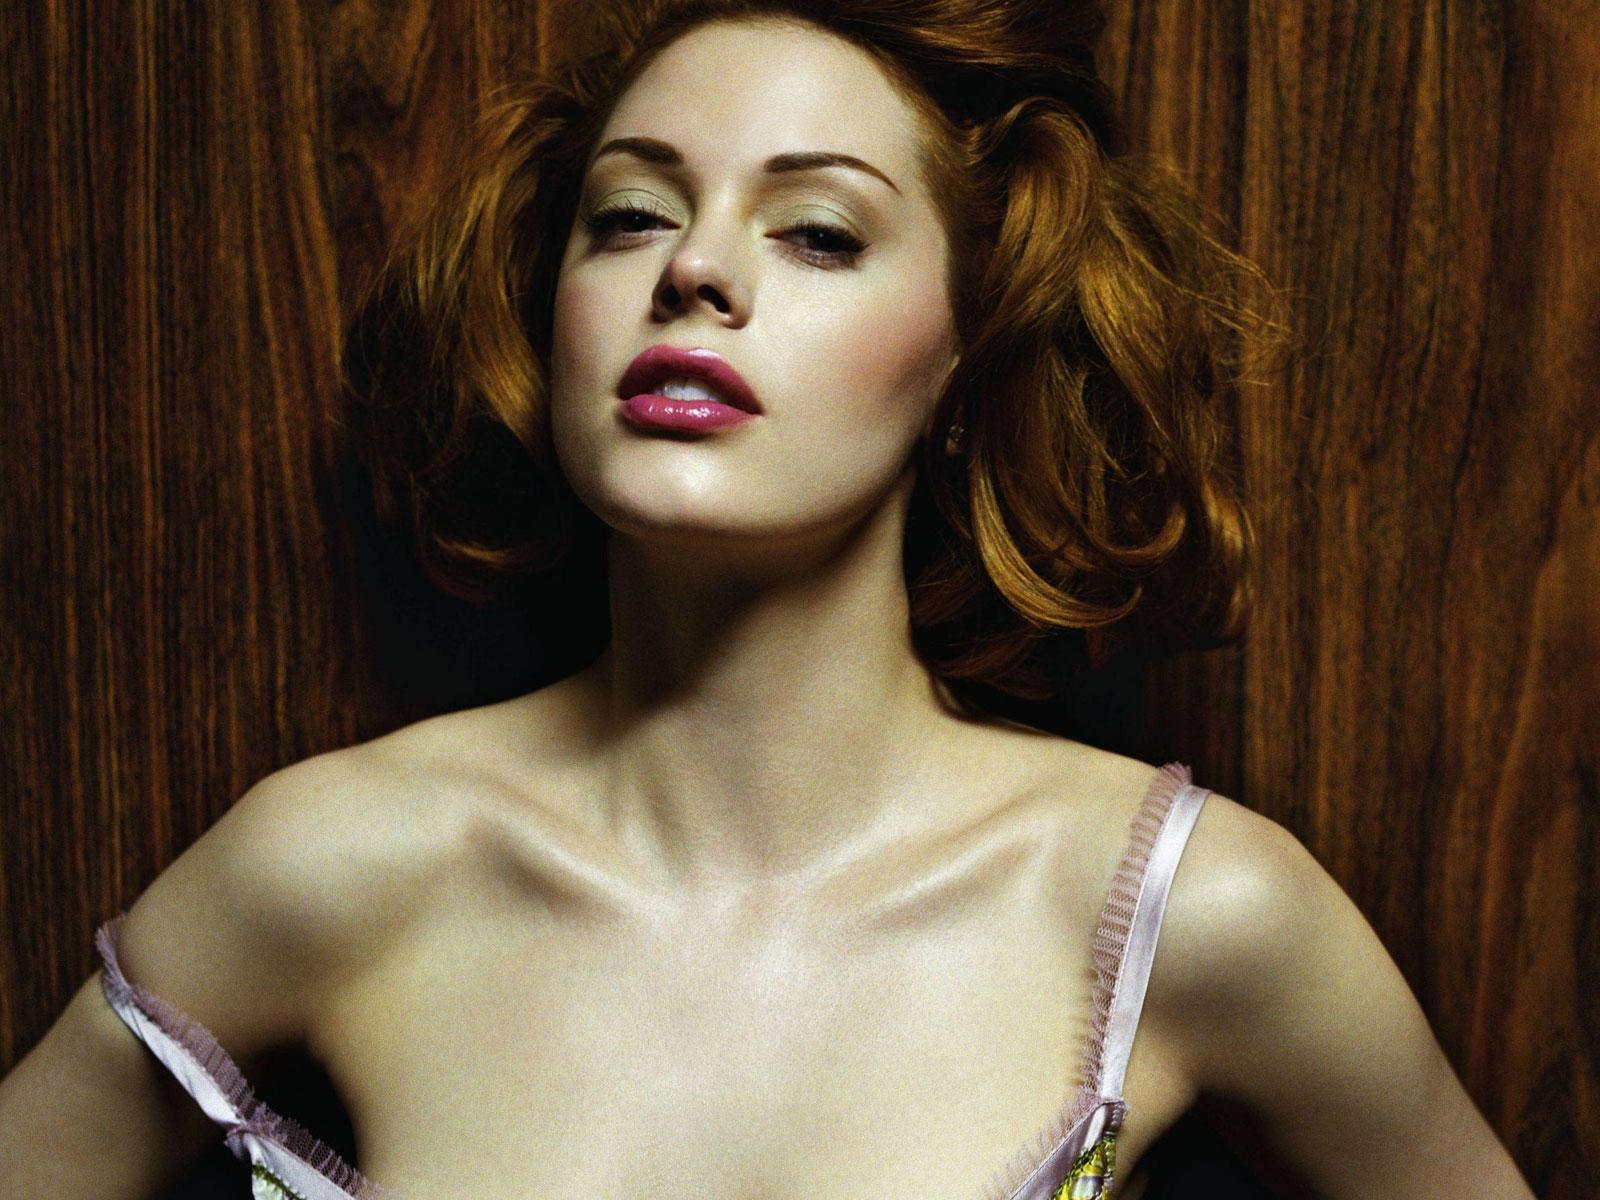 Hot Rose McGowan nude (44 photo), Tits, Bikini, Twitter, swimsuit 2006